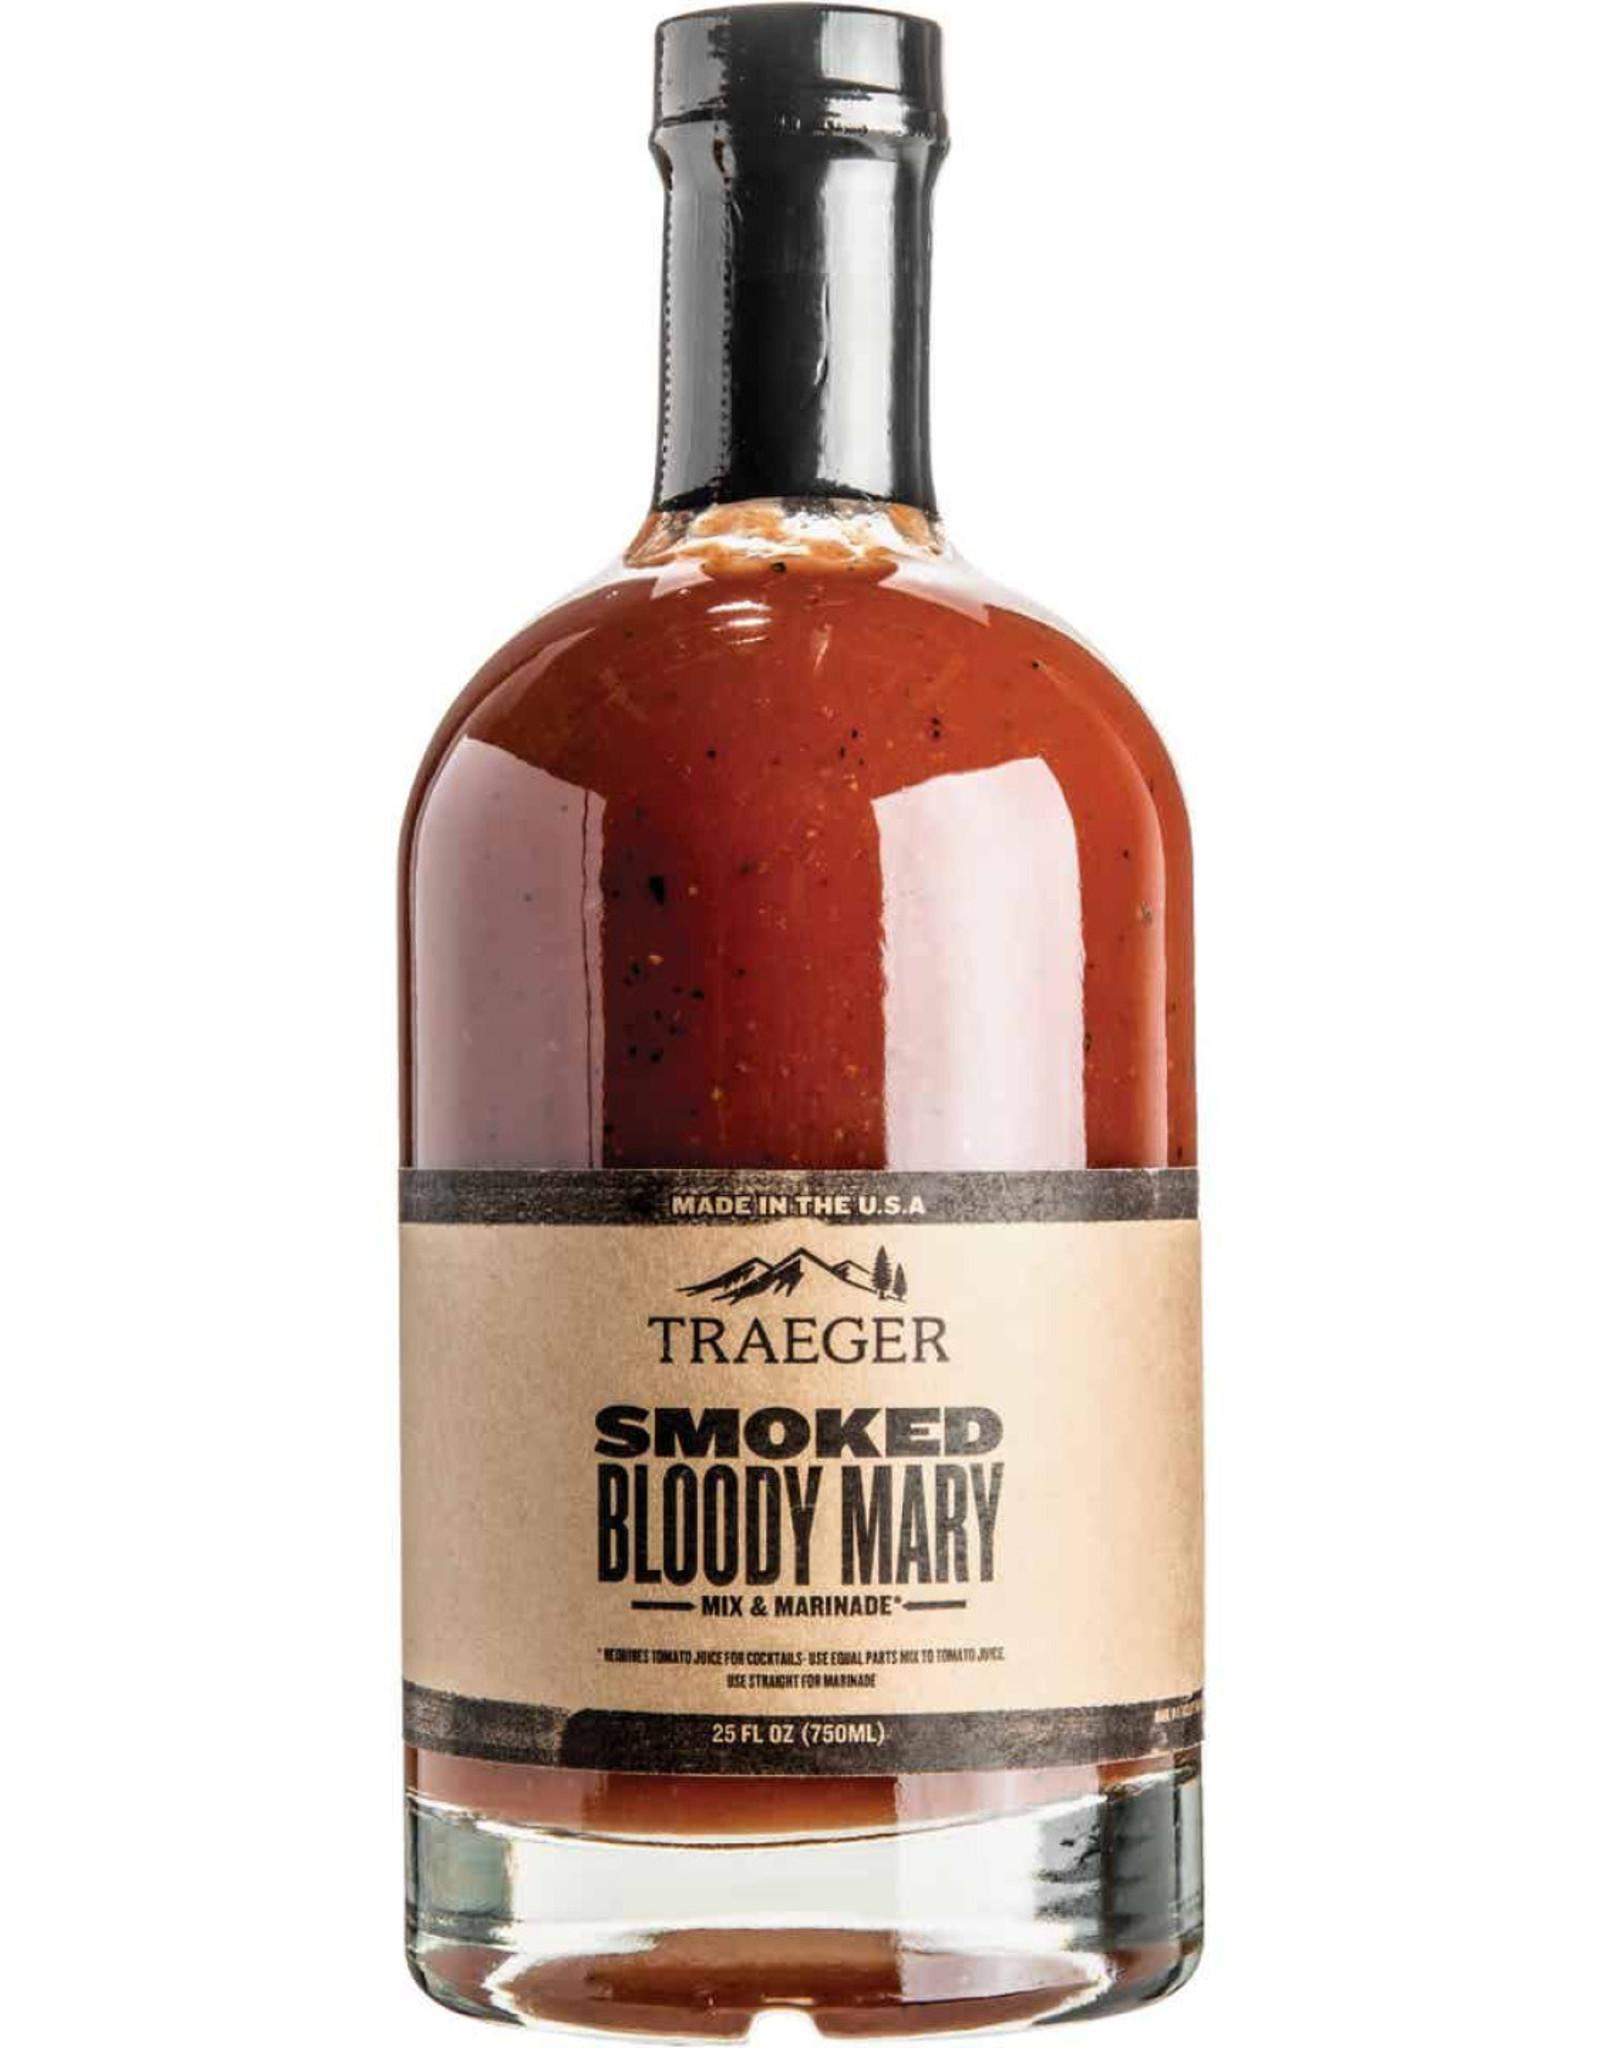 Traeger Traeger Smoked Bloody Mary Mix - MIX002